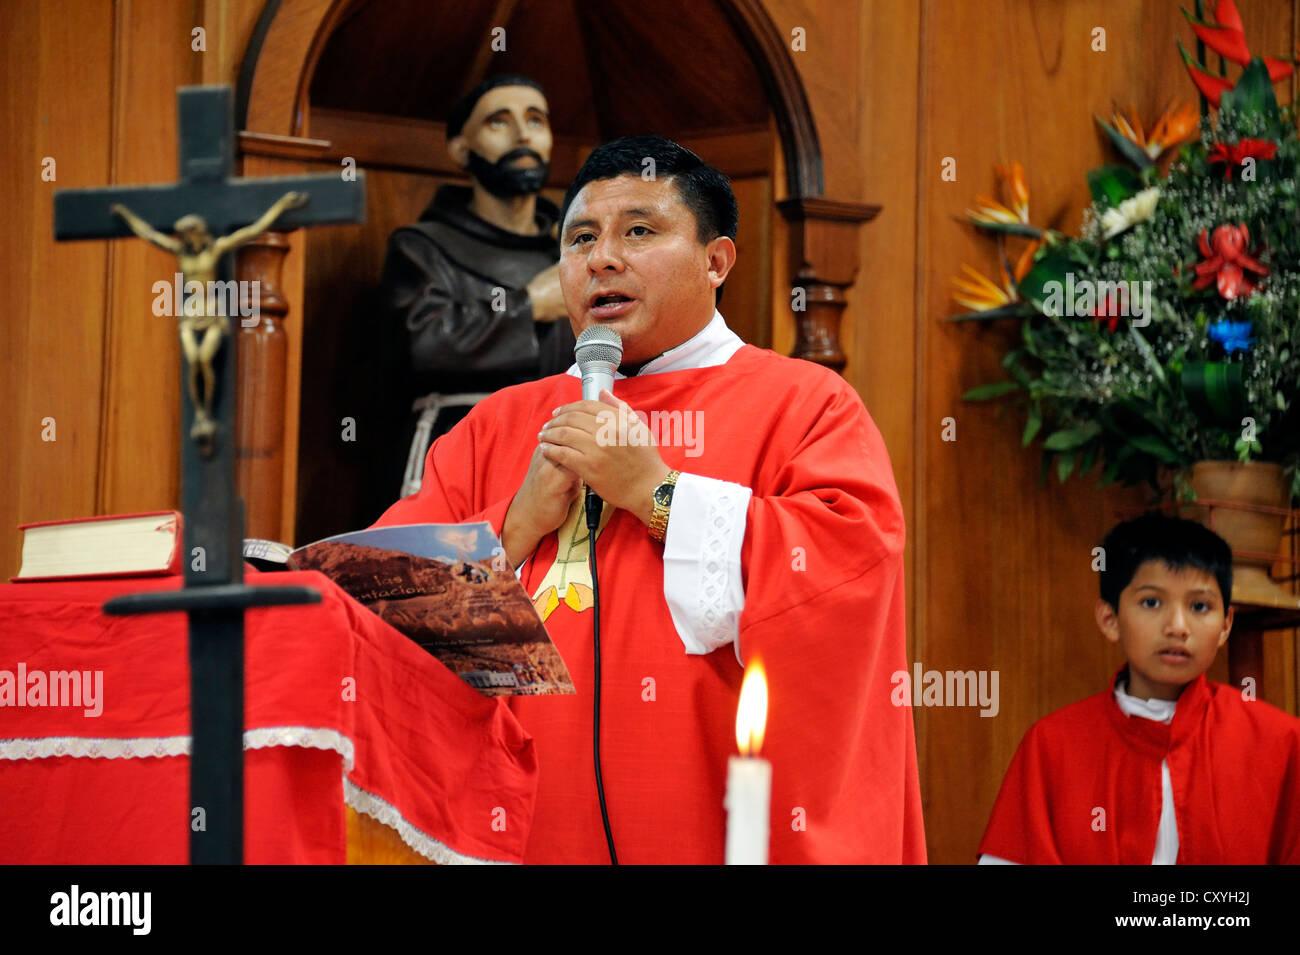 Whitsun mass, preaching, Dios Con Nosotros church parish, El Mesquital, Guatemala City, Guatemala, Central America - Stock Image